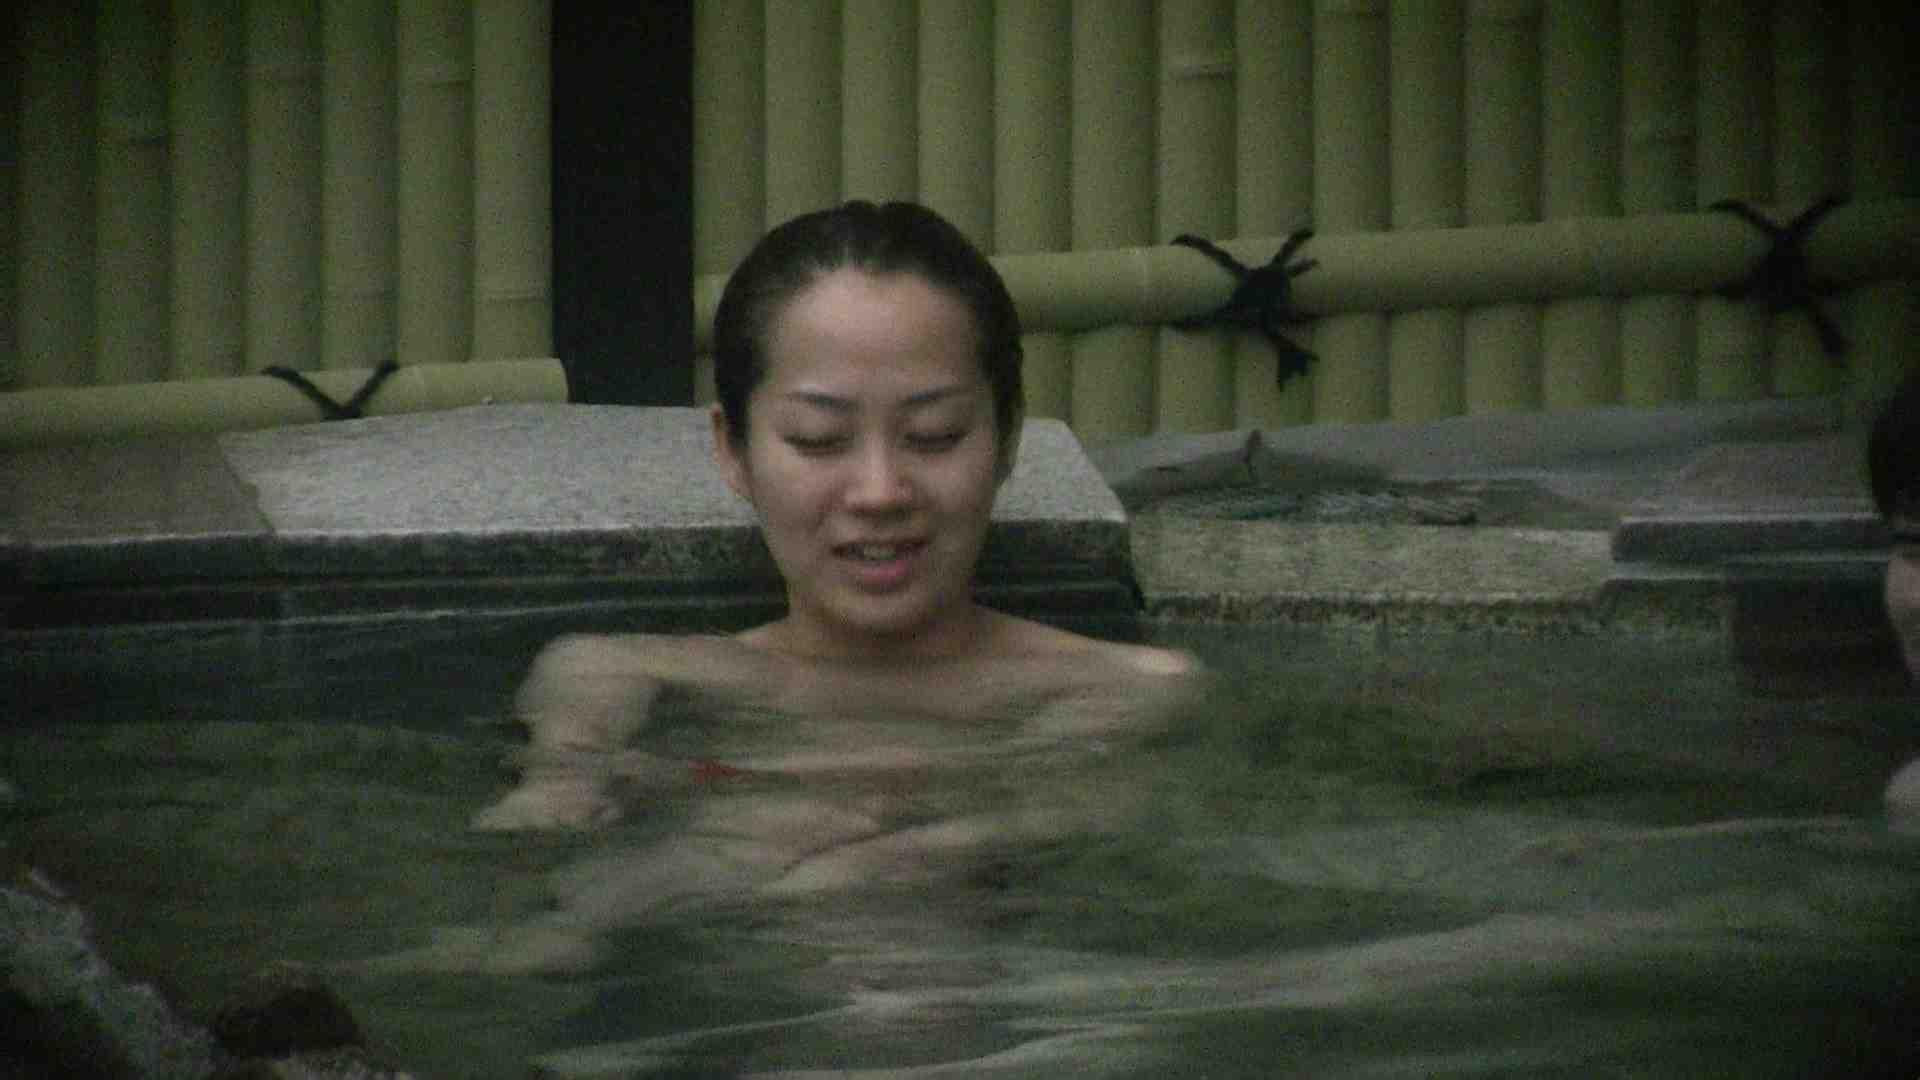 Aquaな露天風呂Vol.539 エロいOL オメコ動画キャプチャ 80枚